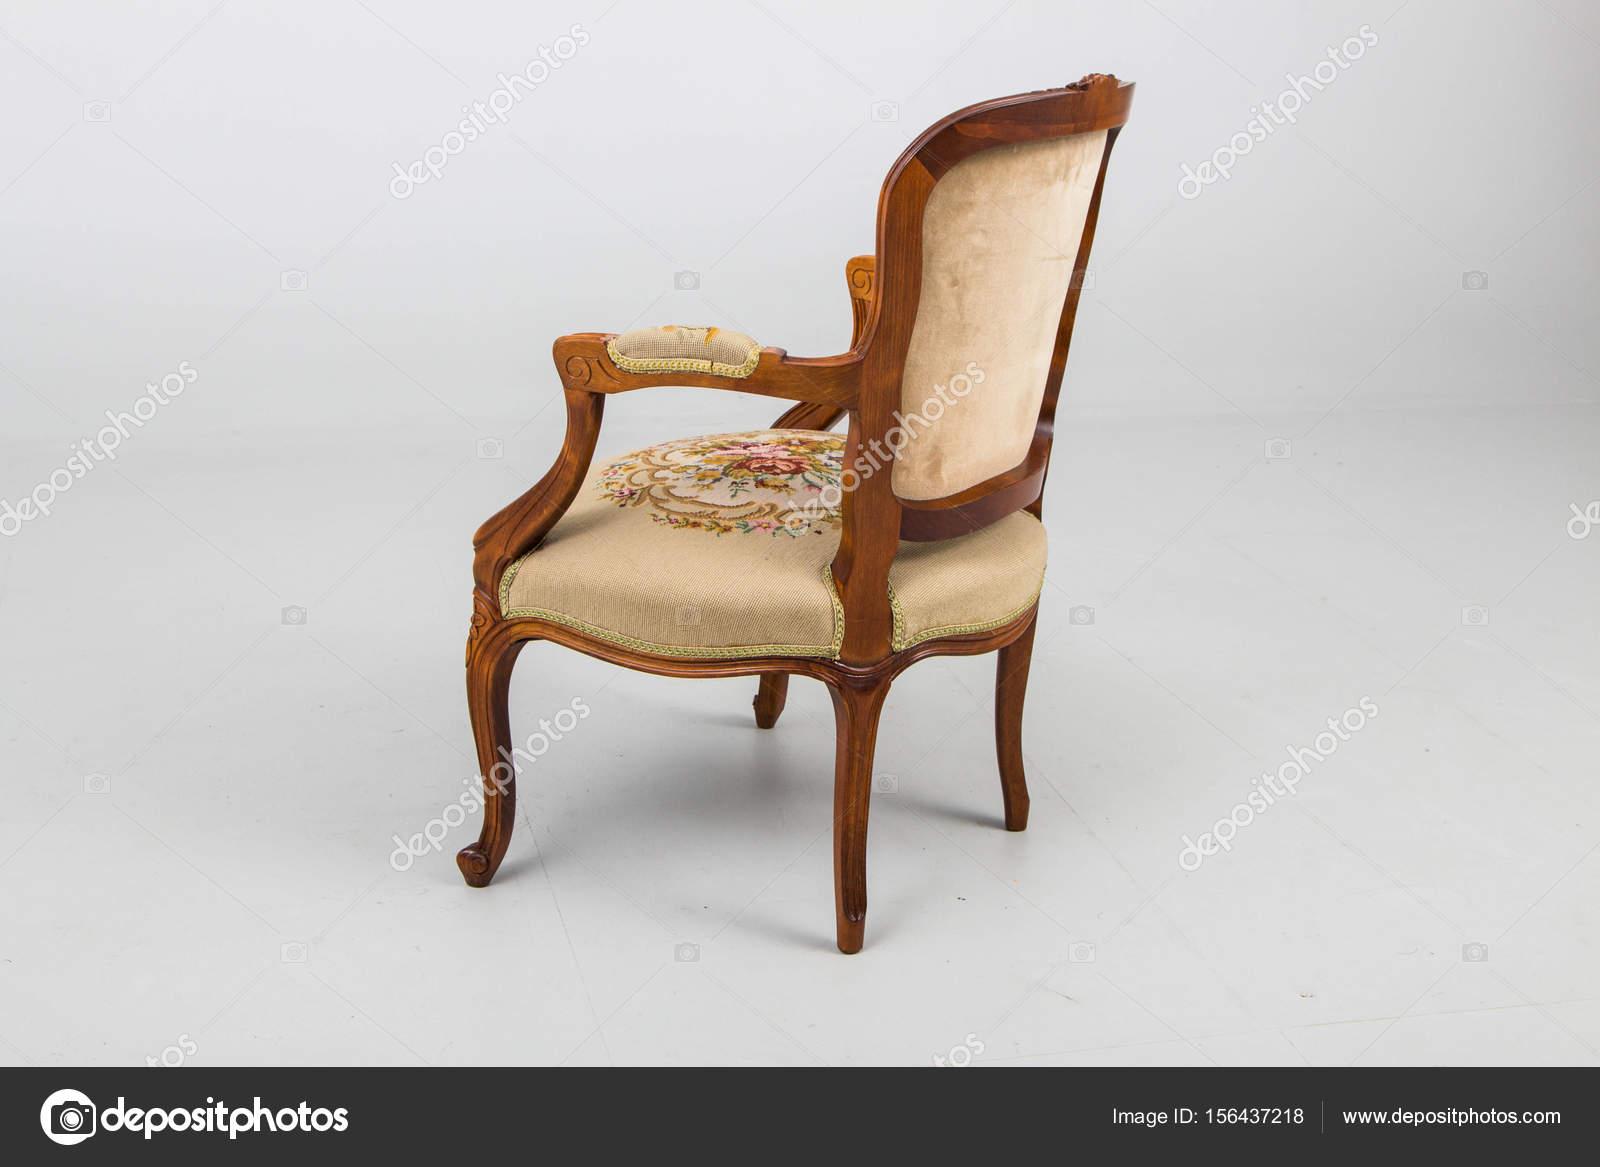 Sedie Poltrone Antiche.Sedie Poltrone Antiche Foto Stock C Jbgroup 156437218